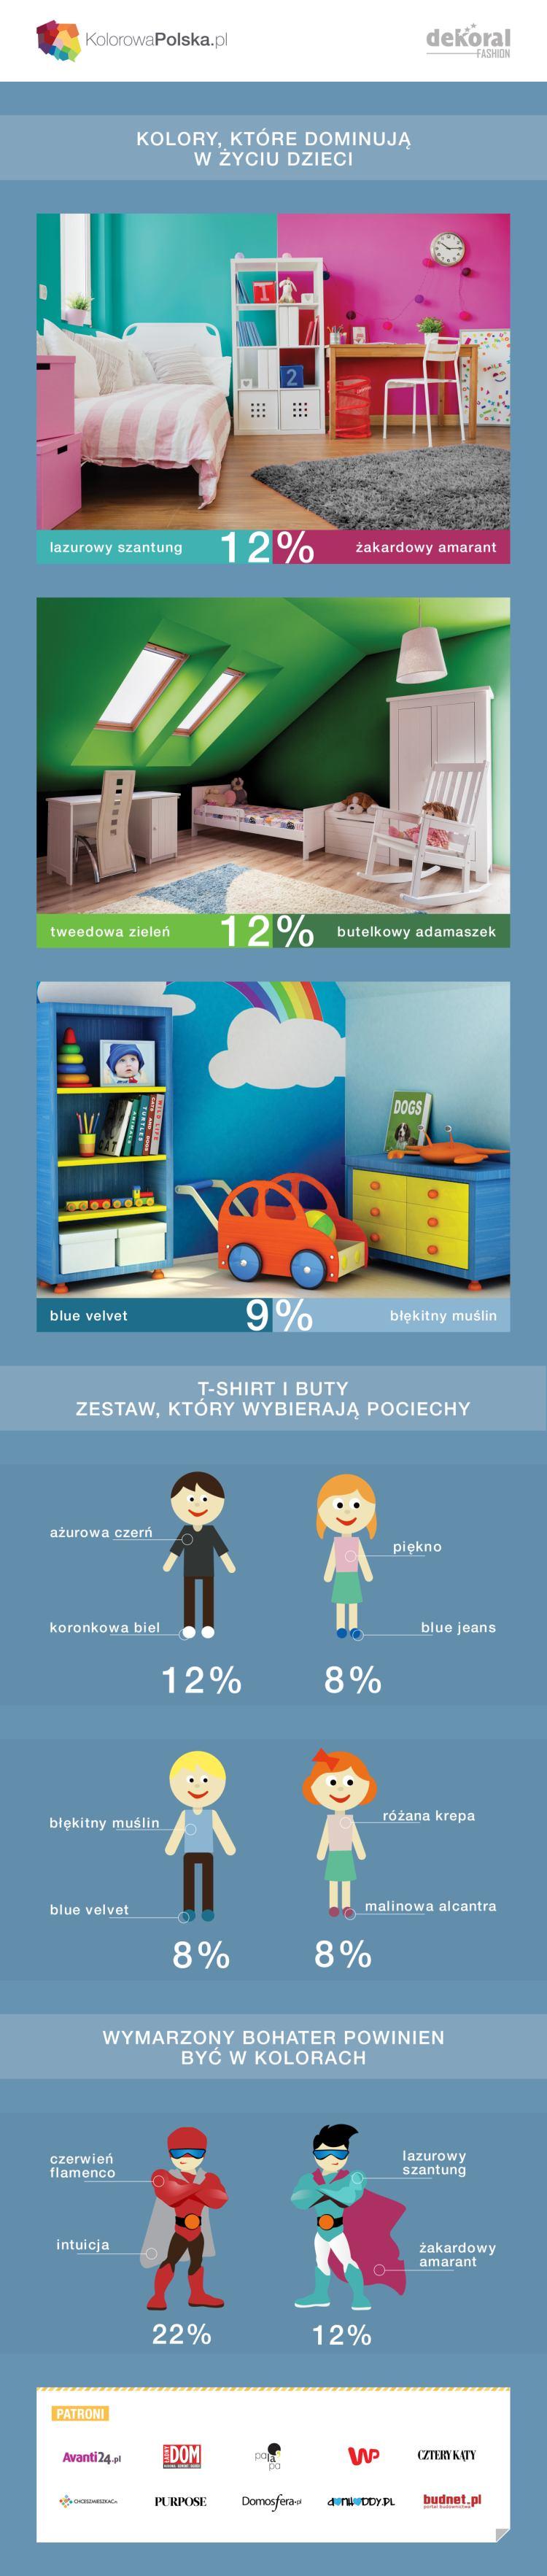 infografika_na_dzien_dziecka_dekoral